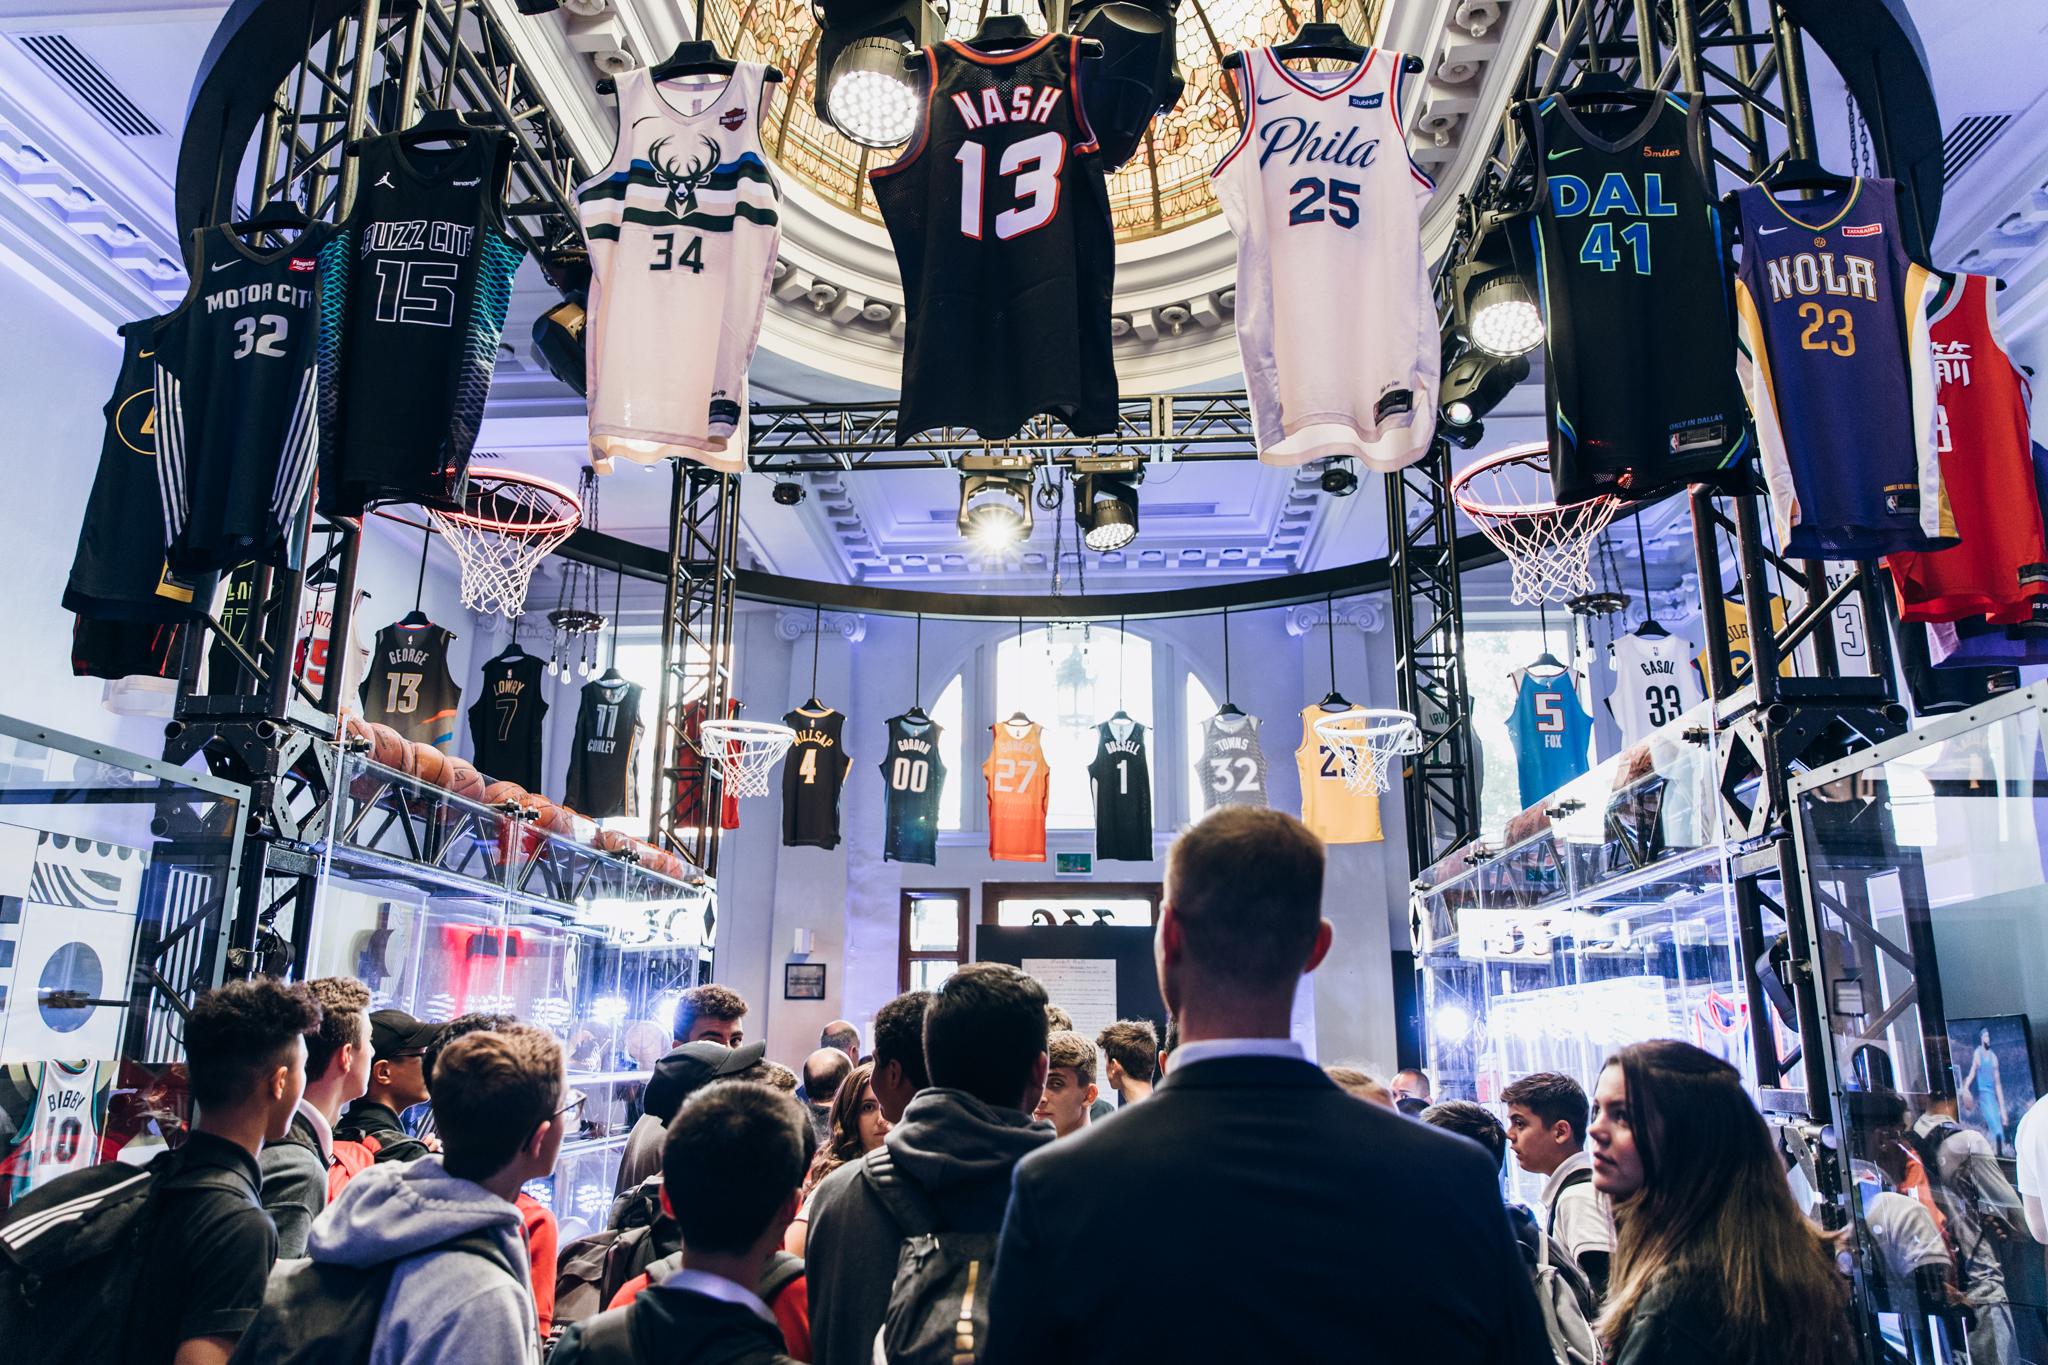 20180928 - NBA Crossover Day 2 -038.jpg